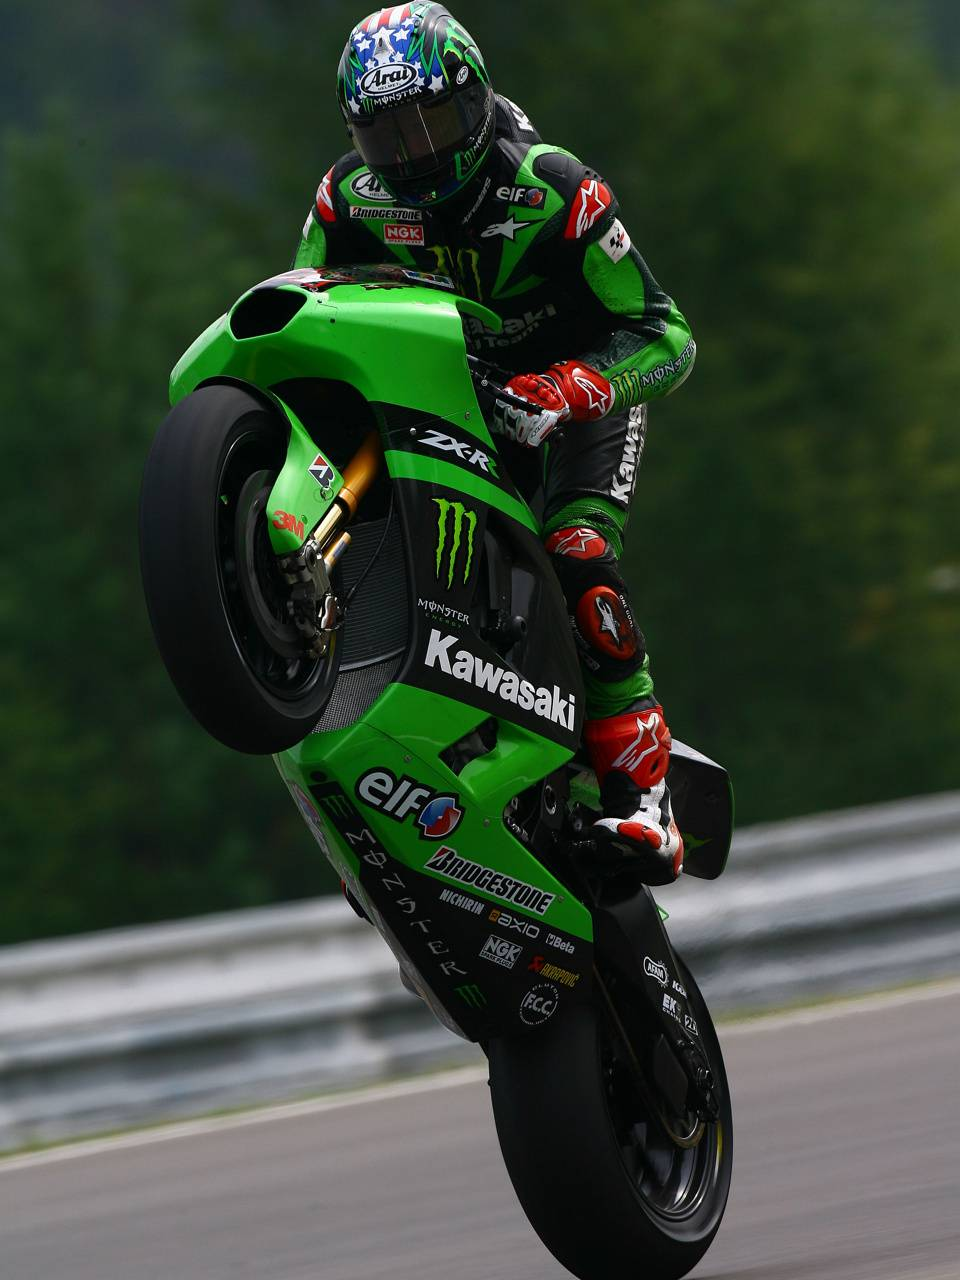 Monster Kawasaki